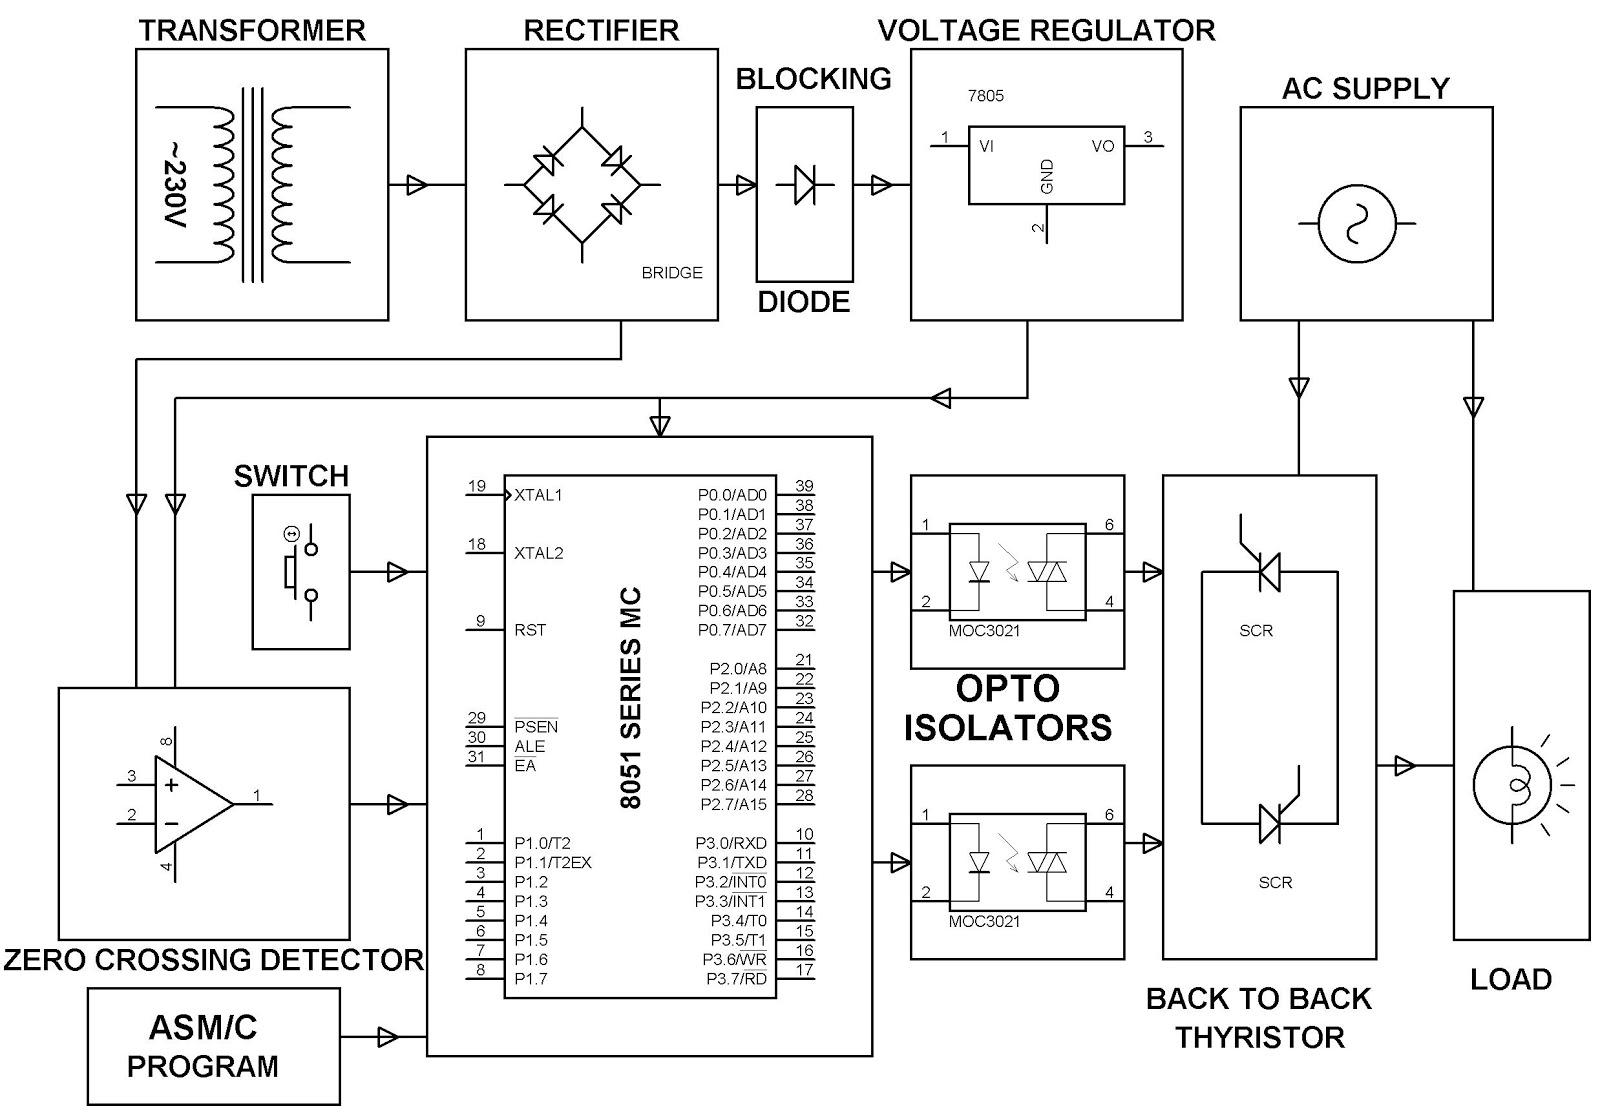 ac motor speed controller circuit diagram john deere f525 mower wiring control kit picture